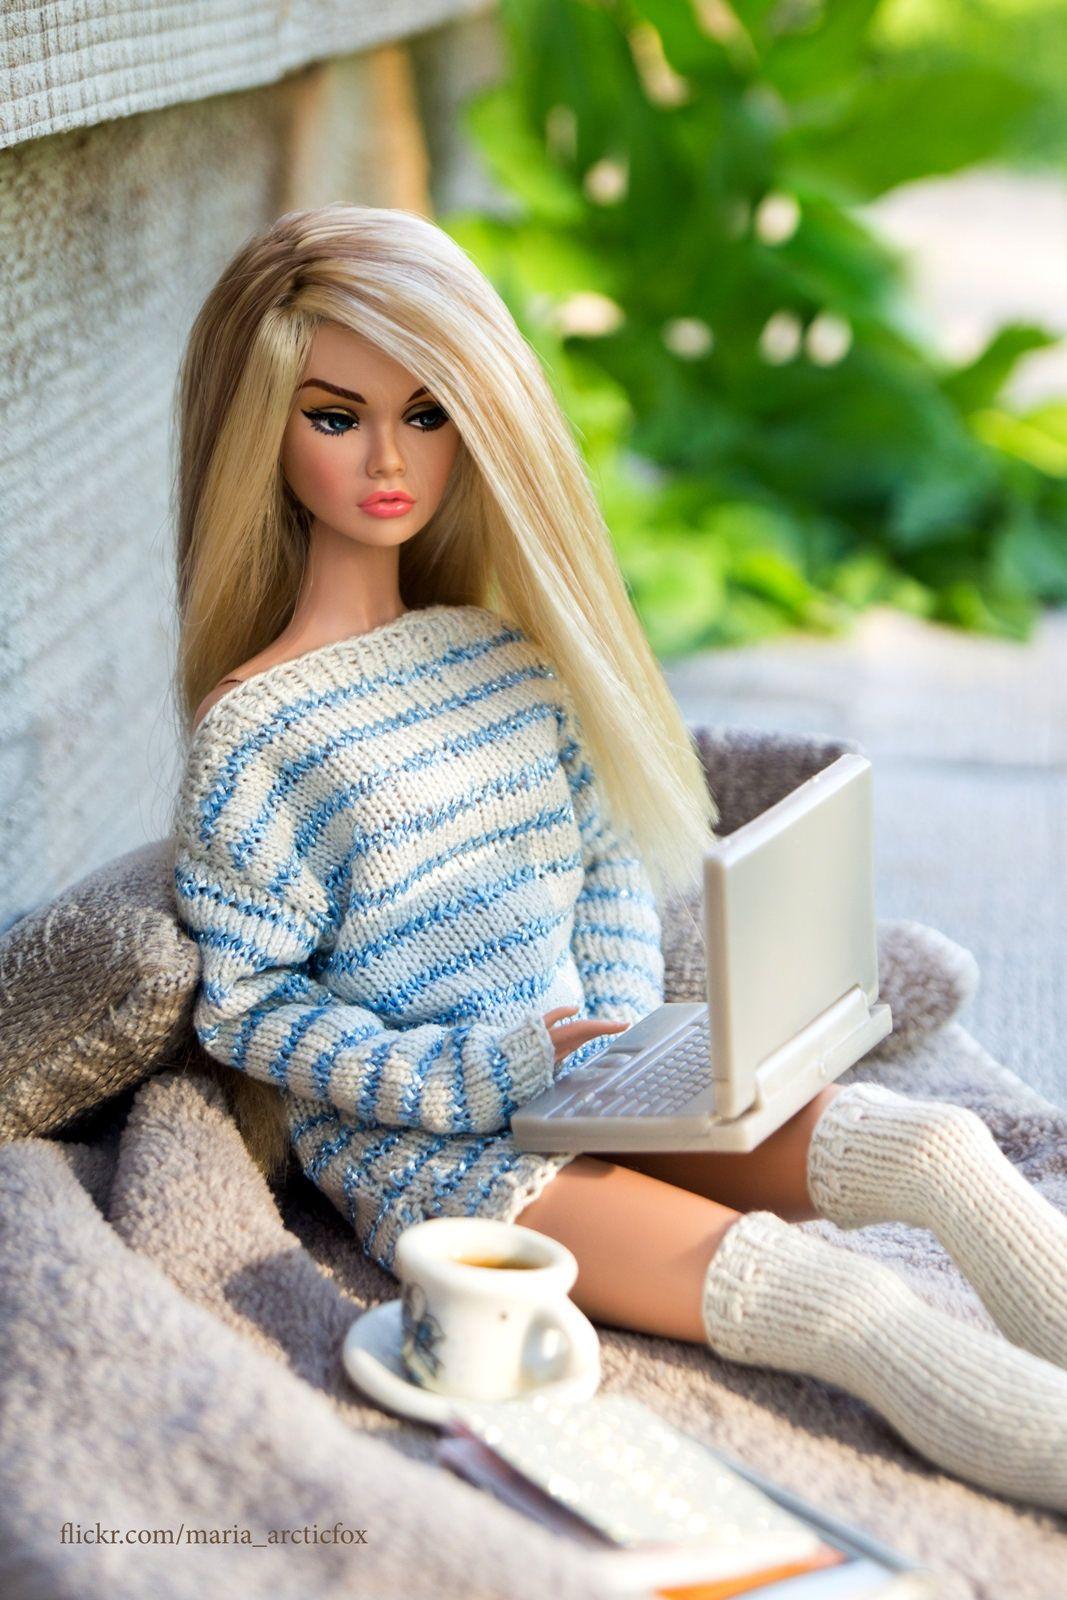 Good Morning Barbie Doll Images : morning, barbie, images, Morning), Barbie, Fashionista, Dolls,, Fashionista,, Fashion, Dolls